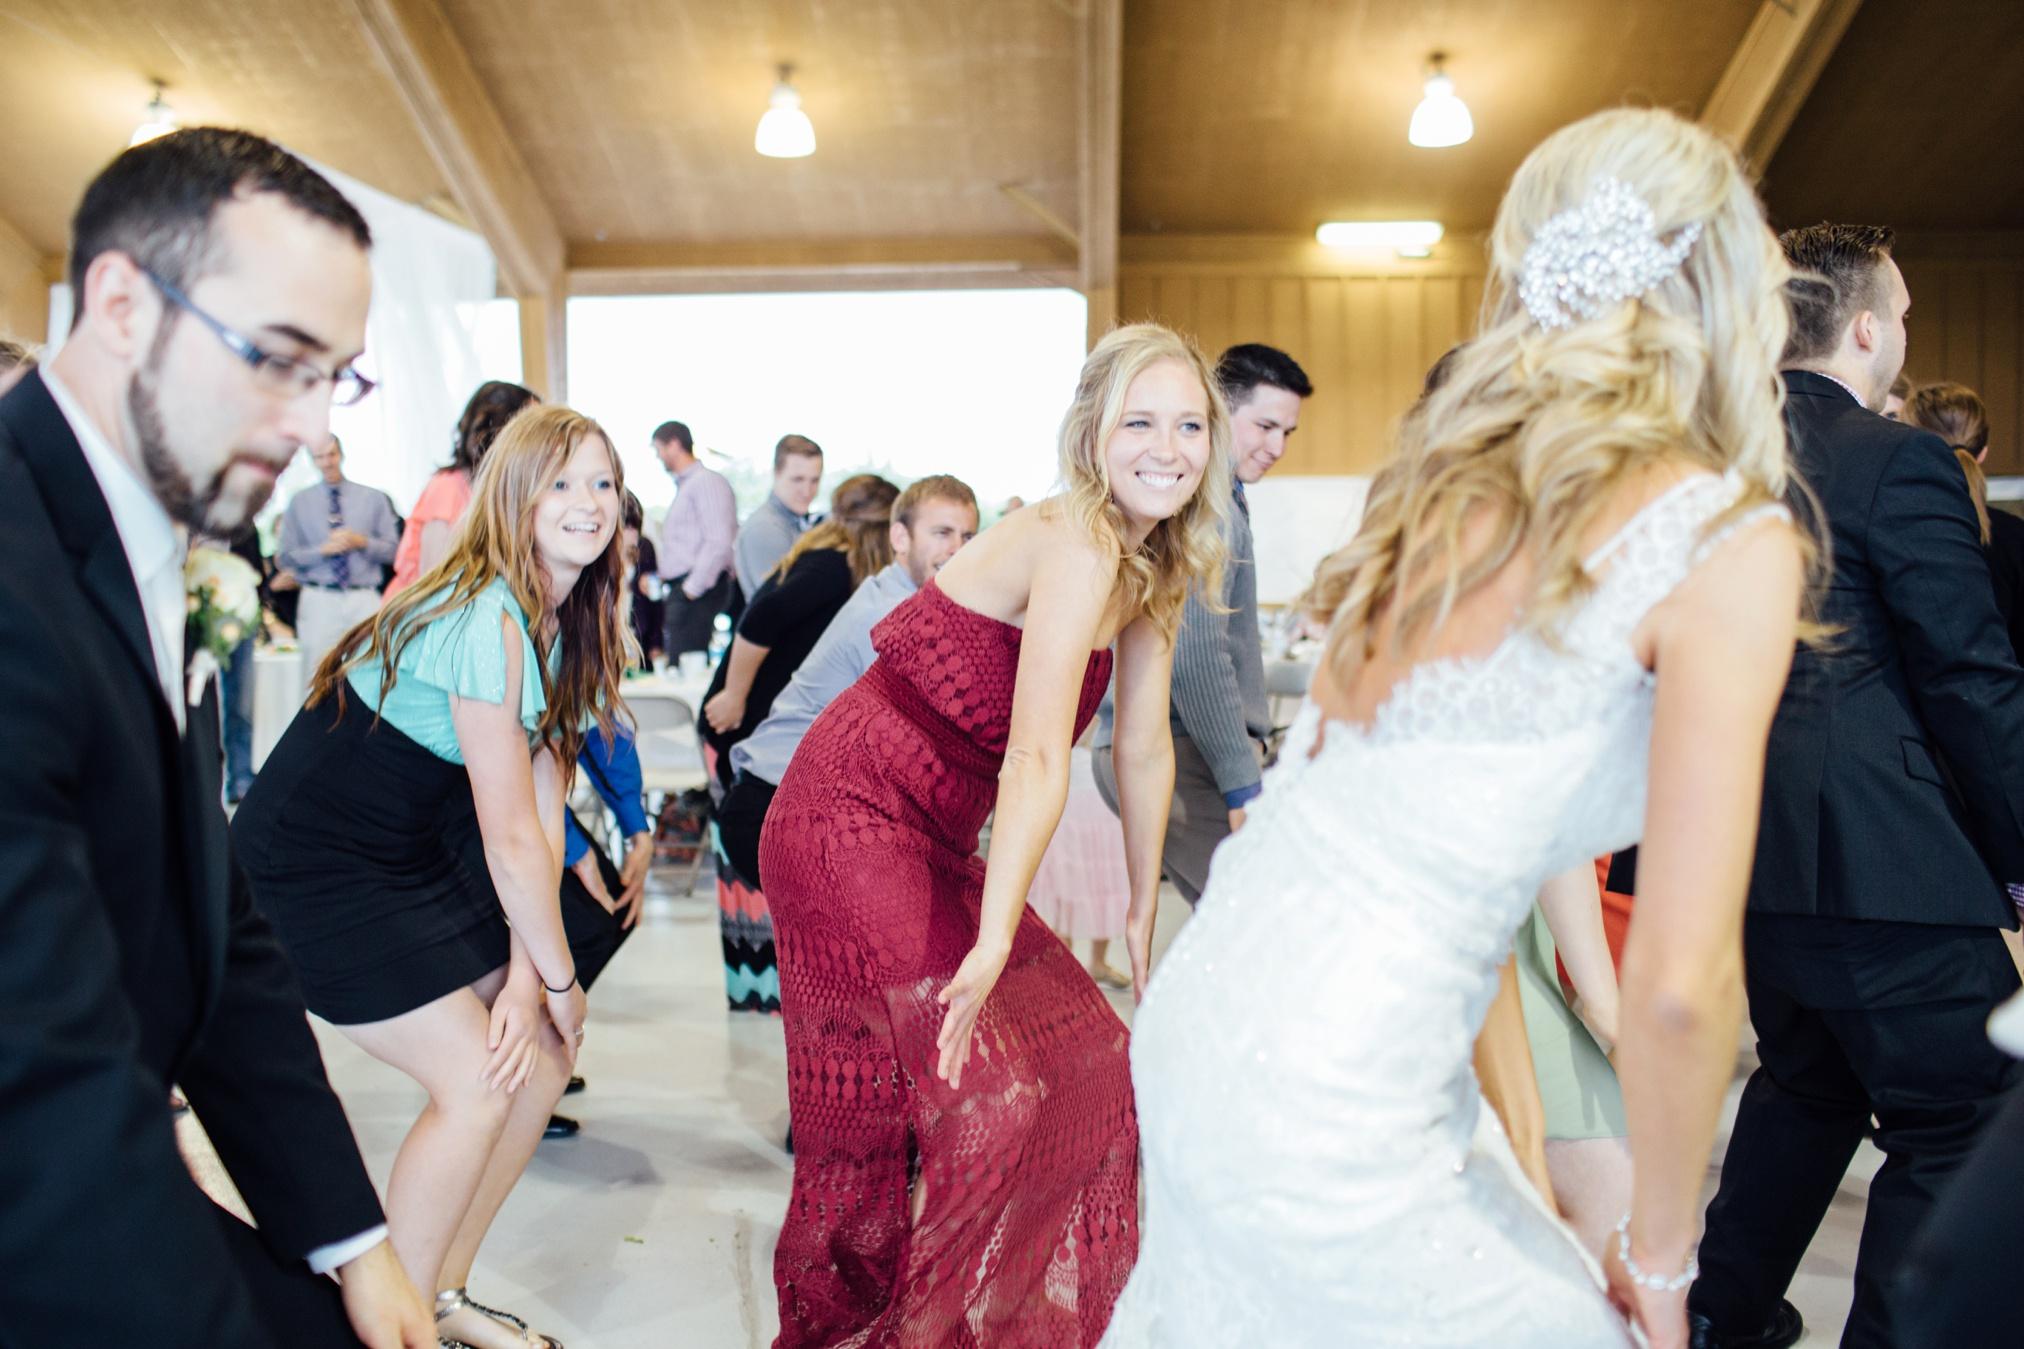 schmid_wedding-886.jpg